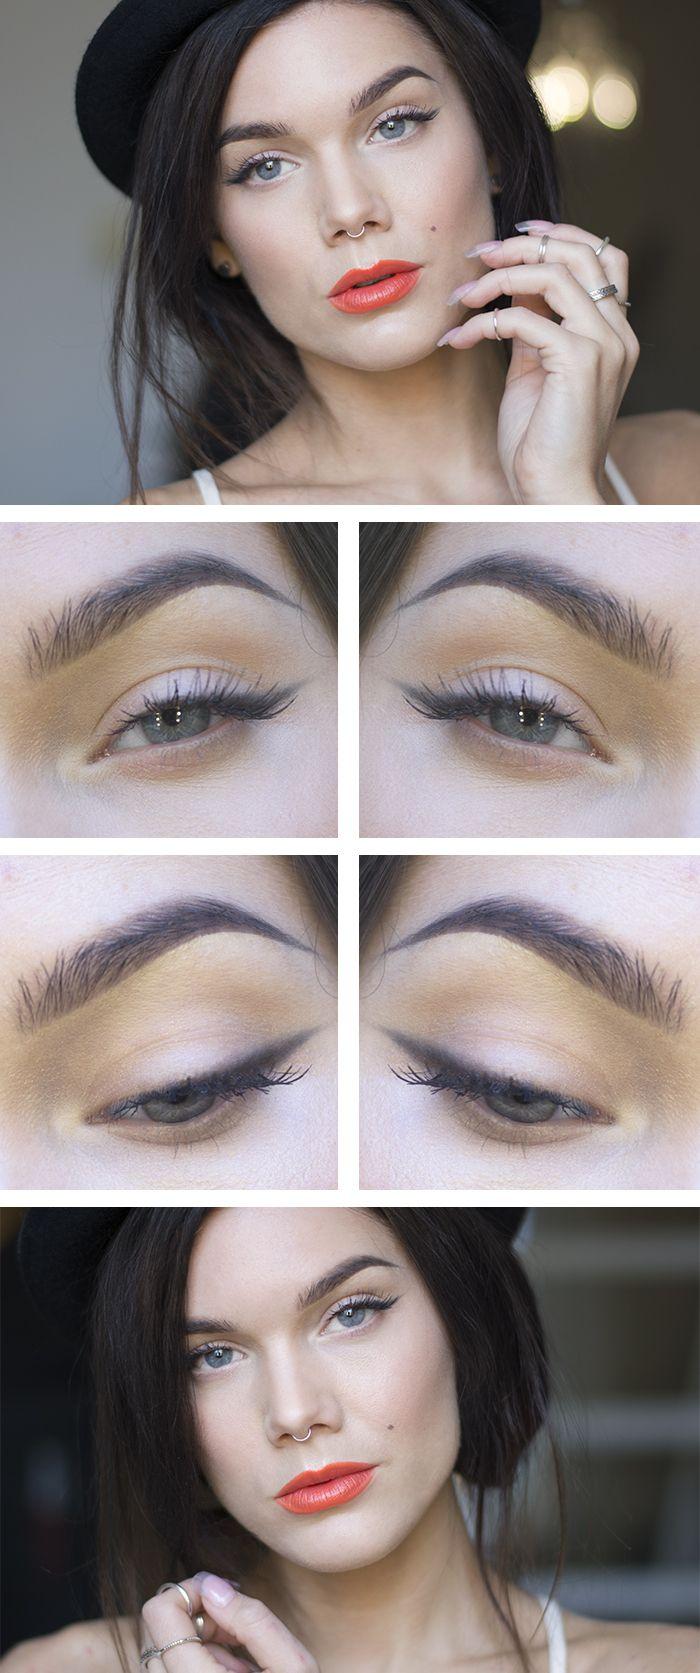 Makeup Gurus On Youtube: 288 Best Images About Makeup Guru: Linda Hallberg On Pinterest